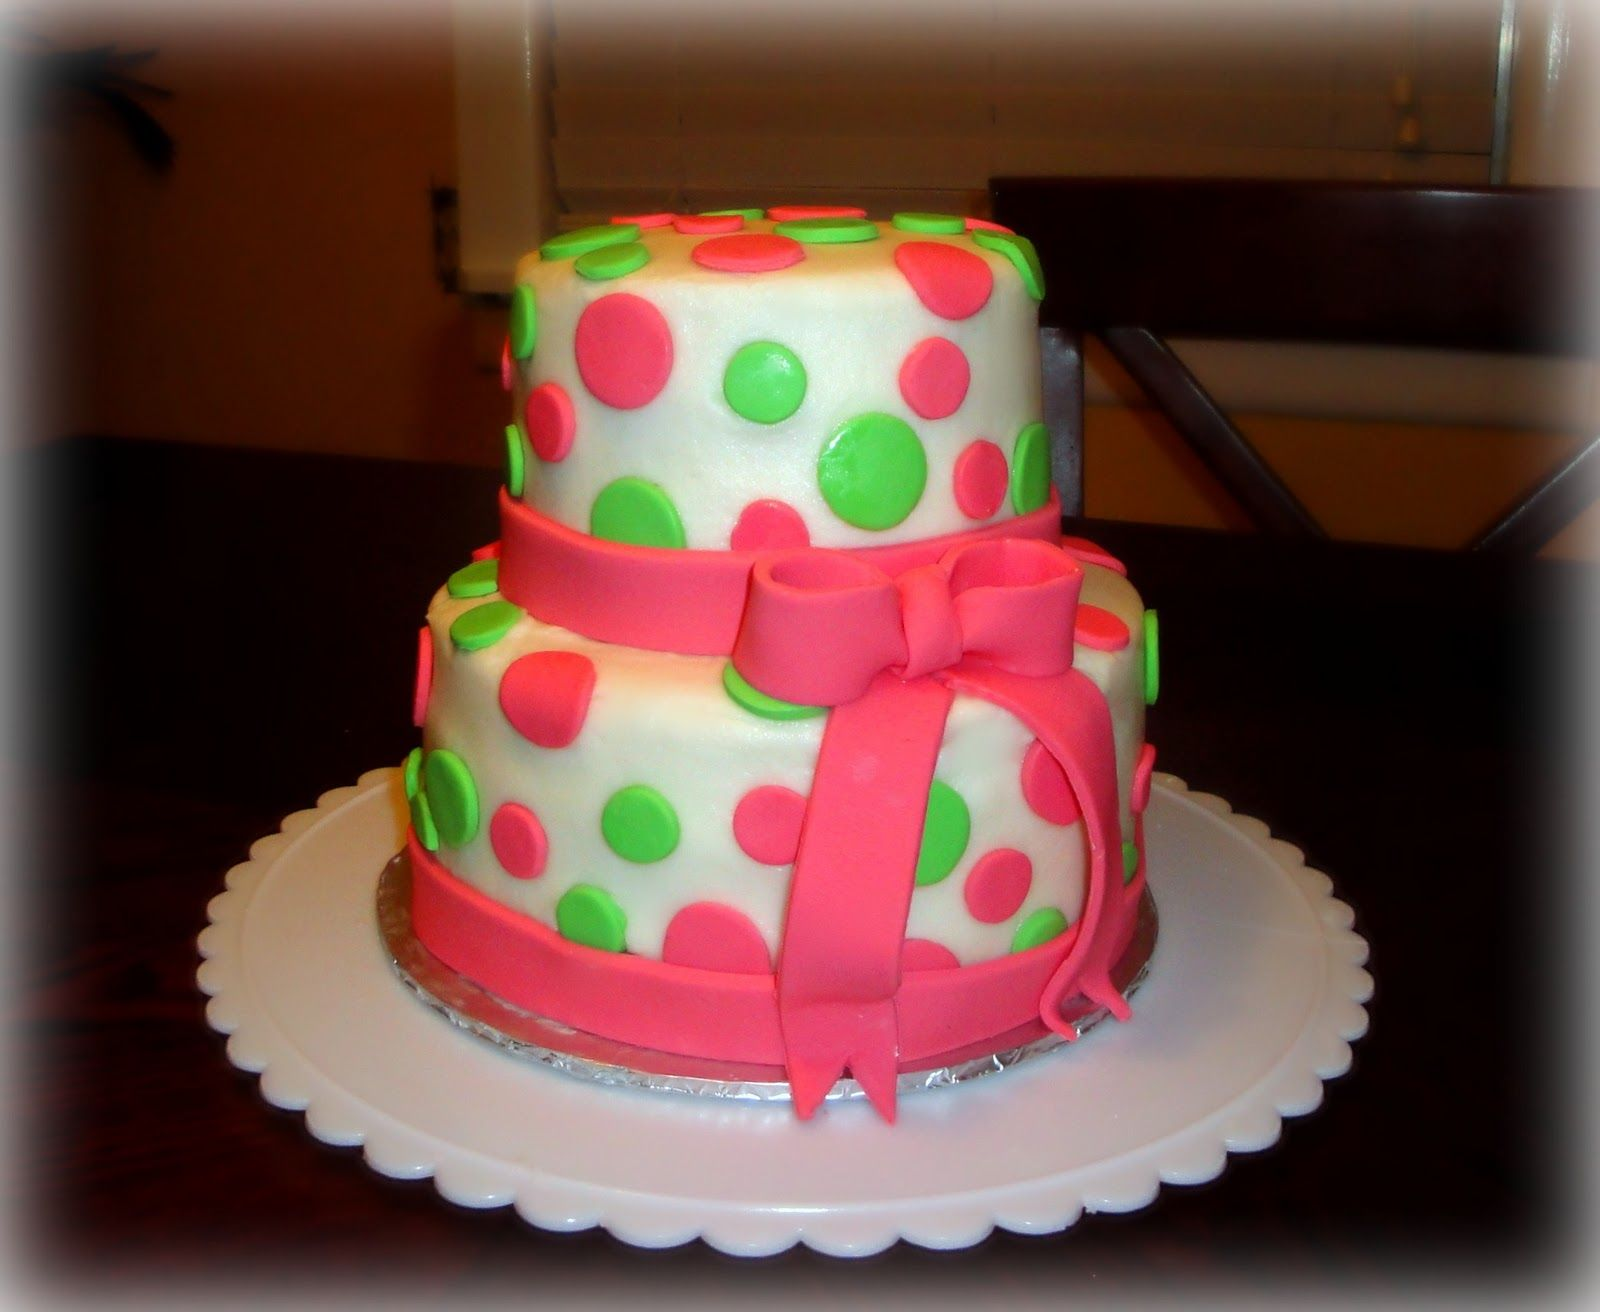 Birthday Cakes For Teenage Girls ~ Cool teenage girl birthday cakes girl's first birthday let them